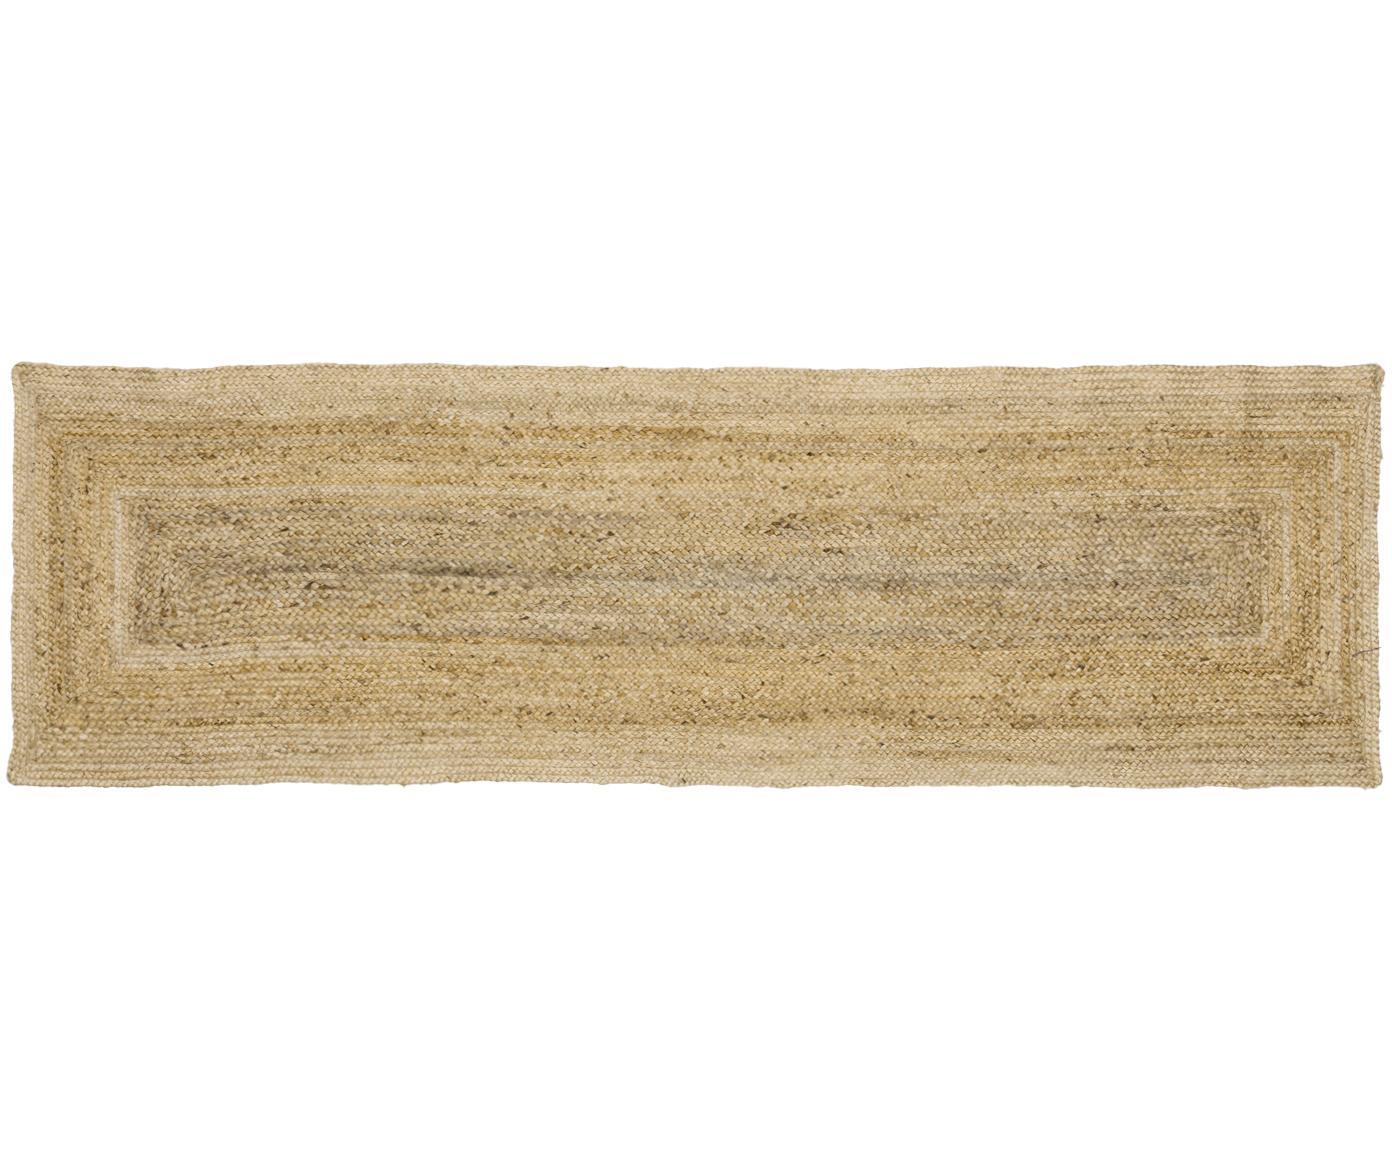 Alfombra artesanal de yute Sharmila, Beige, An 80 x L 250 cm